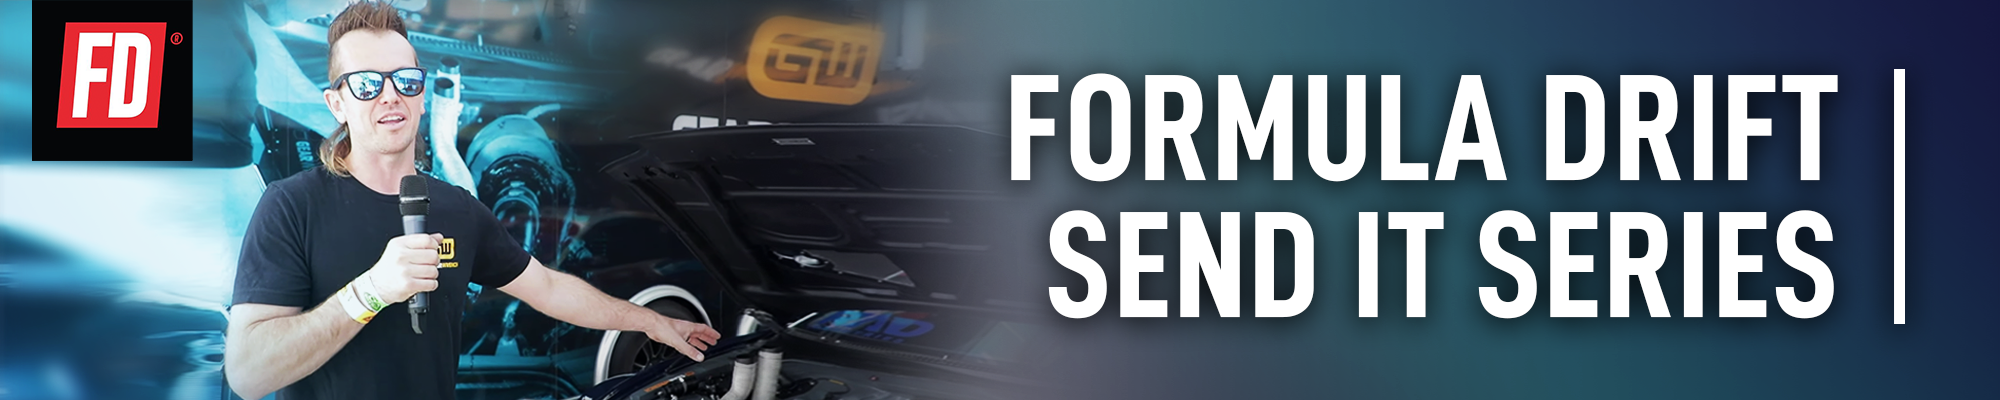 Formula Drift Send It Series